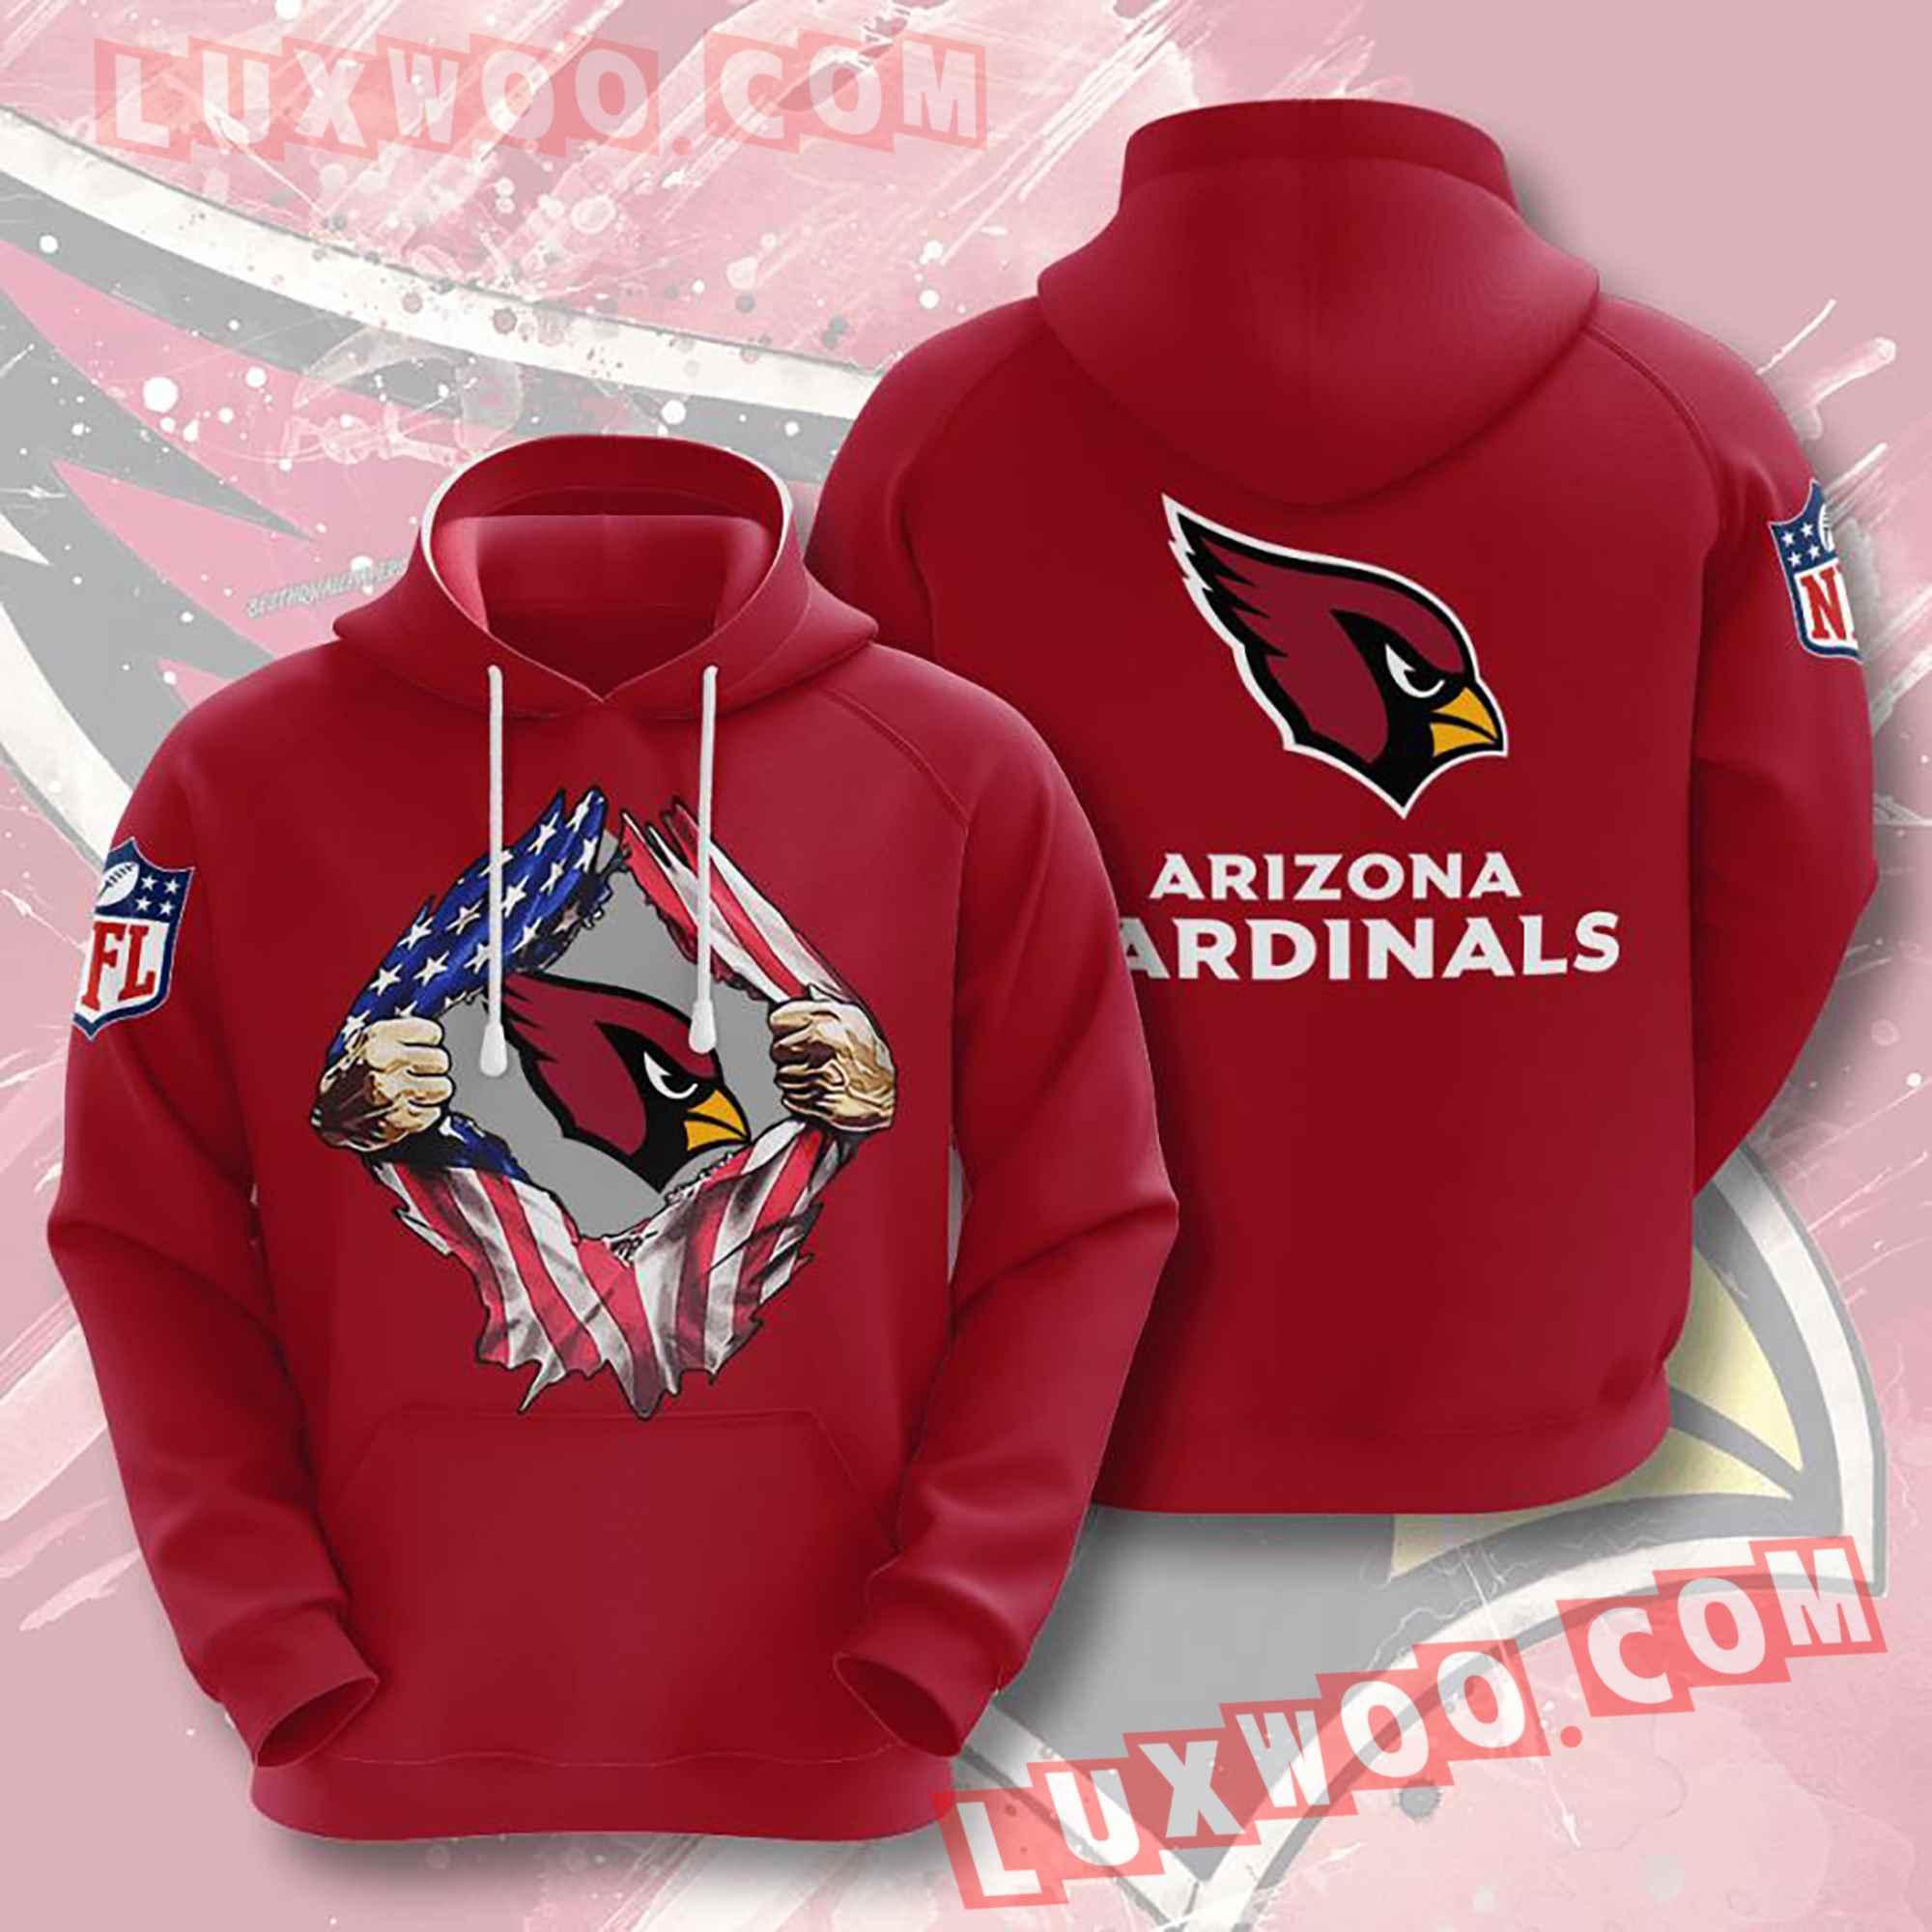 Nfl Arizona Cardinals Hoodies Custom All Over Print 3d Pullover Hoodie V5